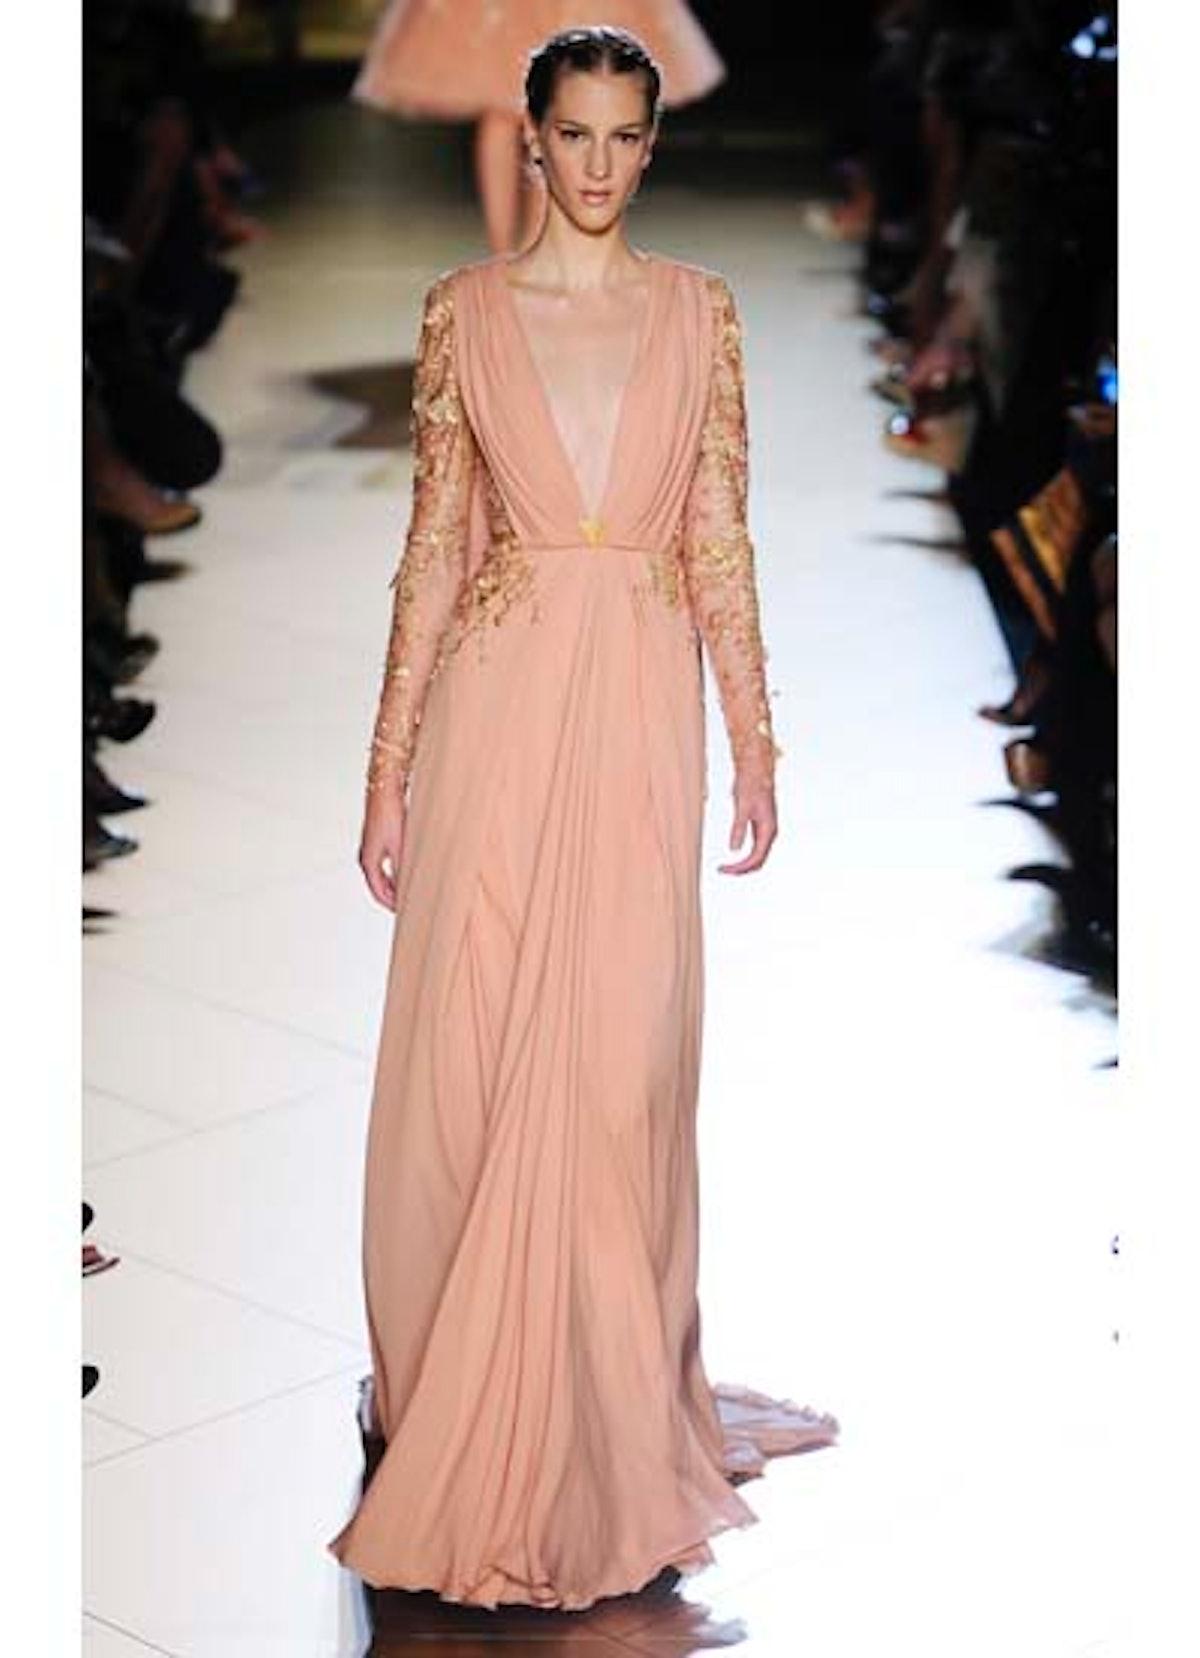 fass-elie-saab-couture-2012-runway-17-v.jpg